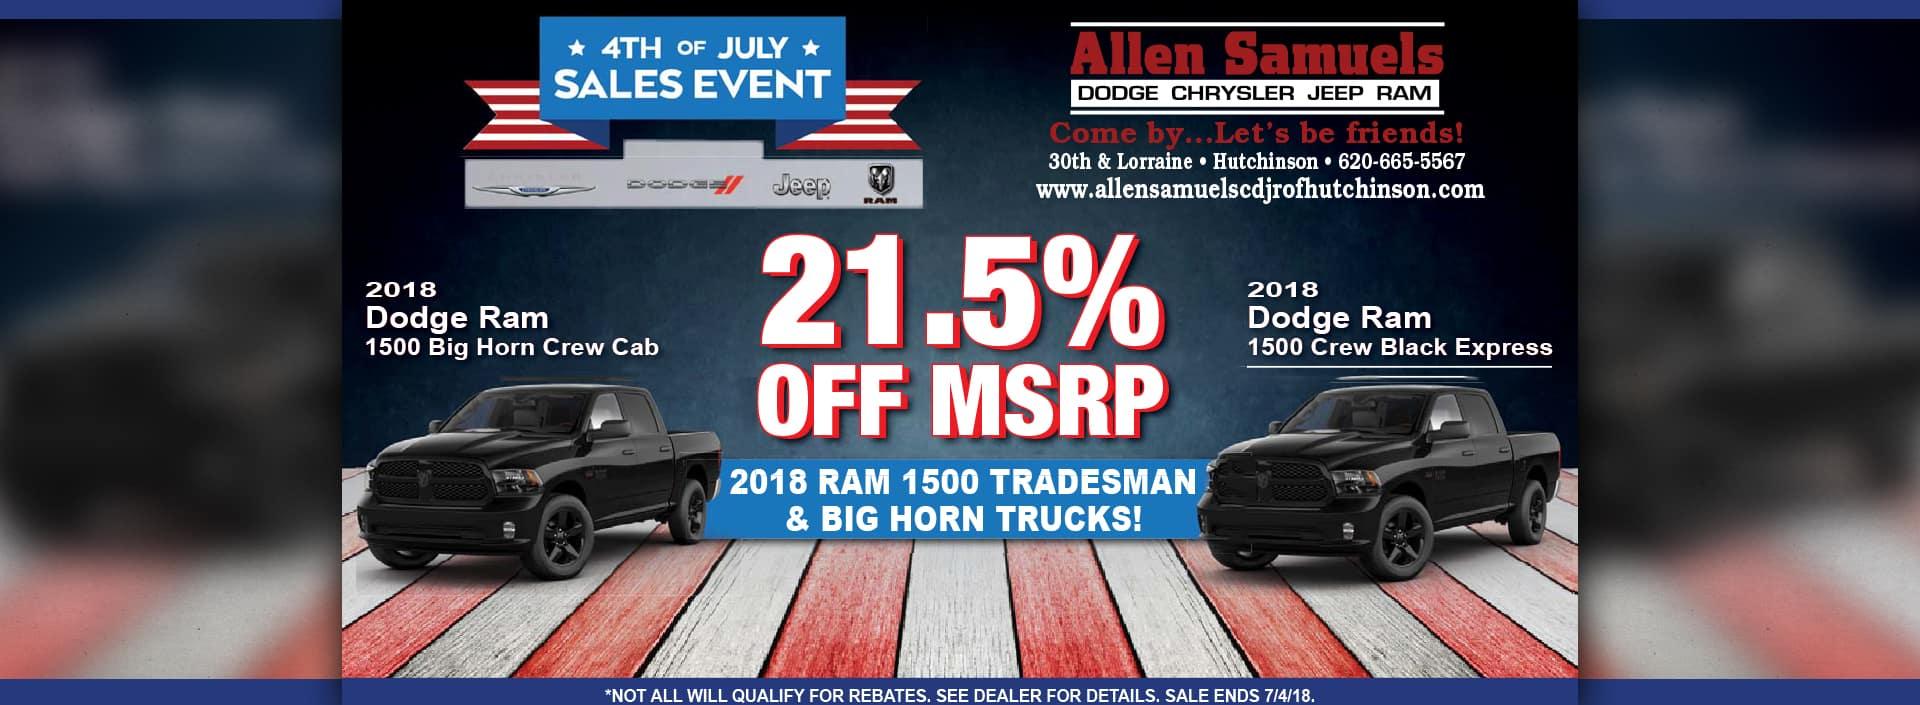 July 4th Sale at Allen Samuels CDJR Hutchinson